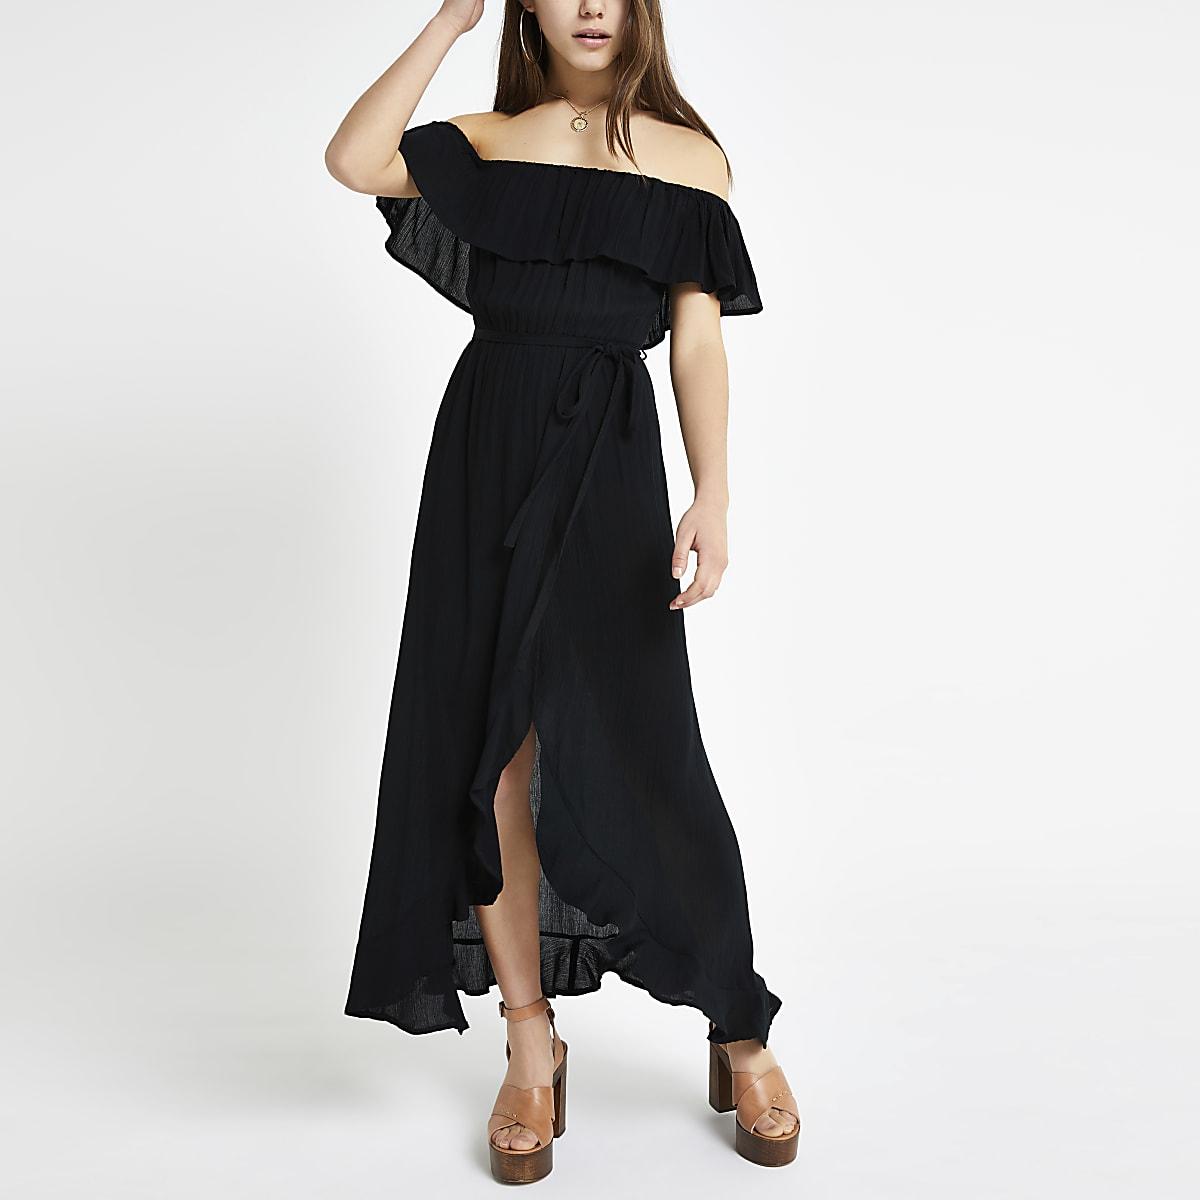 69f418de42 Petite black bardot tie waist maxi dress - Maxi Dresses - Dresses - women